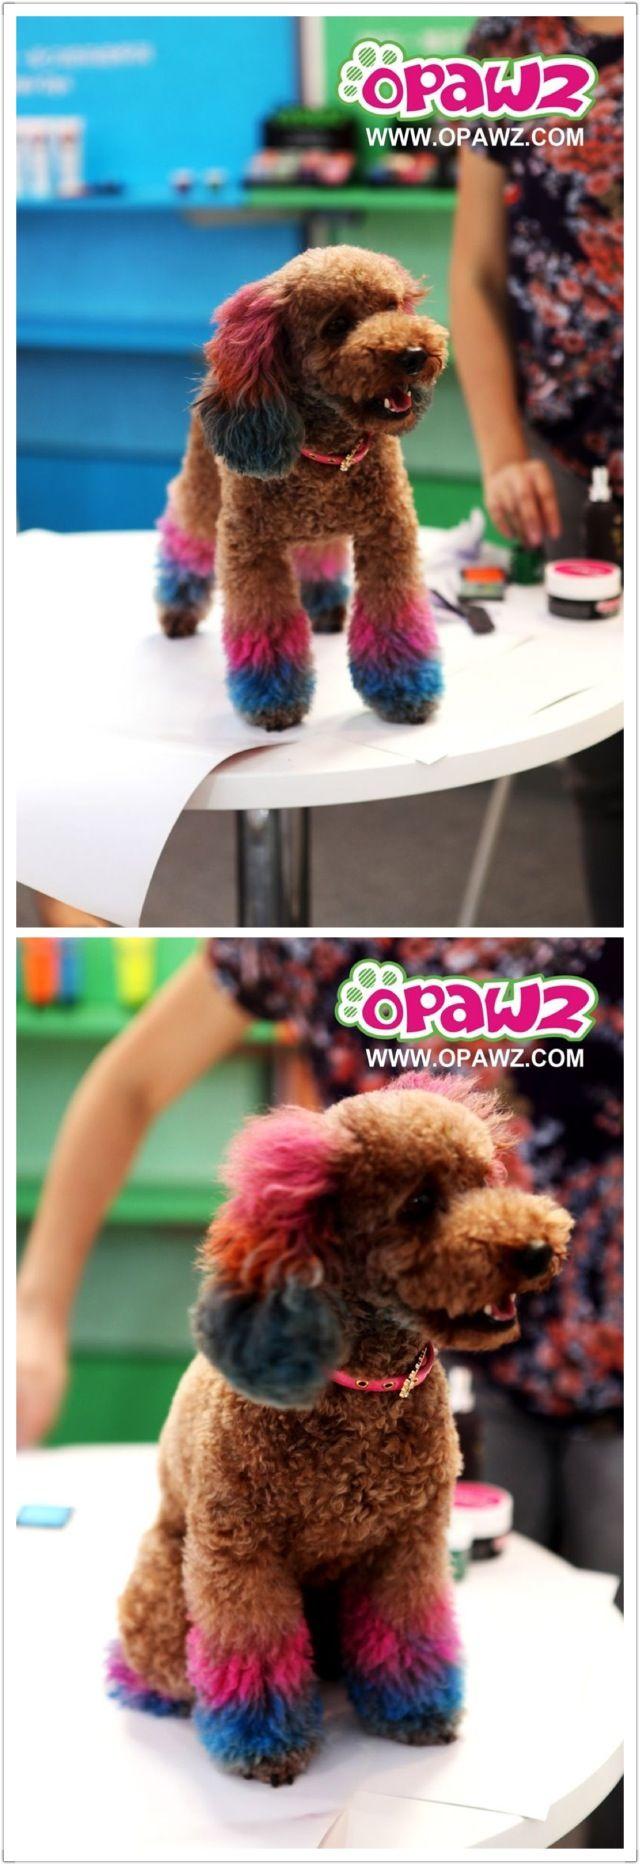 OPAWZ anticipated Pet Fair Asia; opawz.com supply pet hair dye,pet hair chalk,pet perfume,pet shampoo,spa products